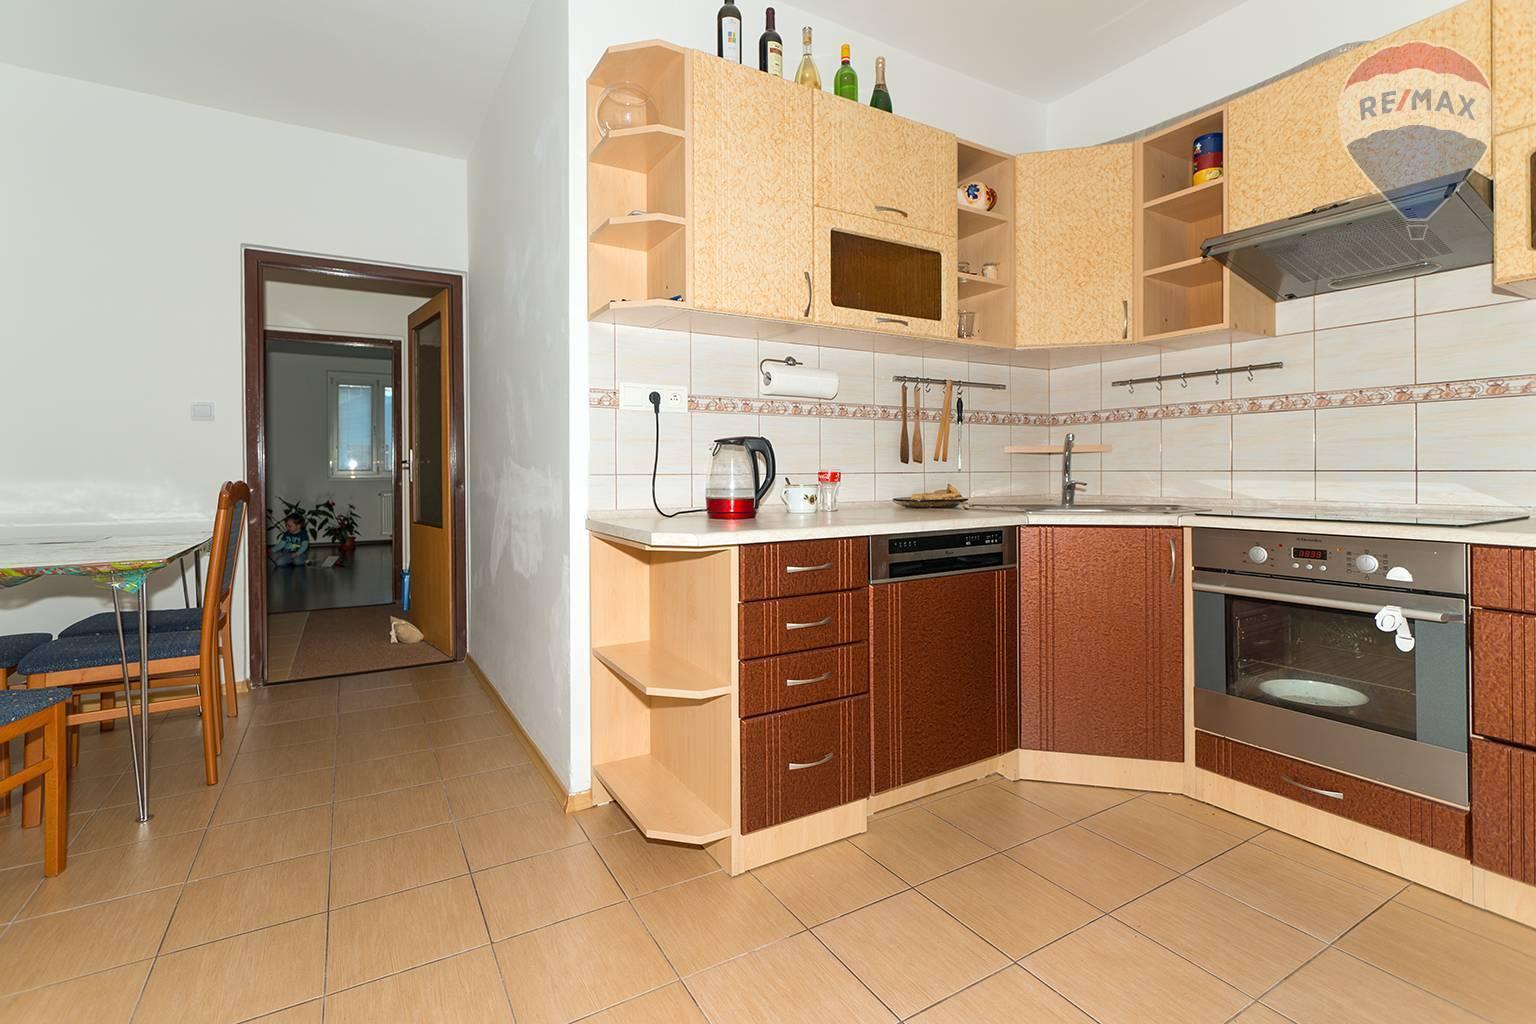 Predám 4 izbový byt 90 m2, Liptovský Mikuláš - Podbreziny